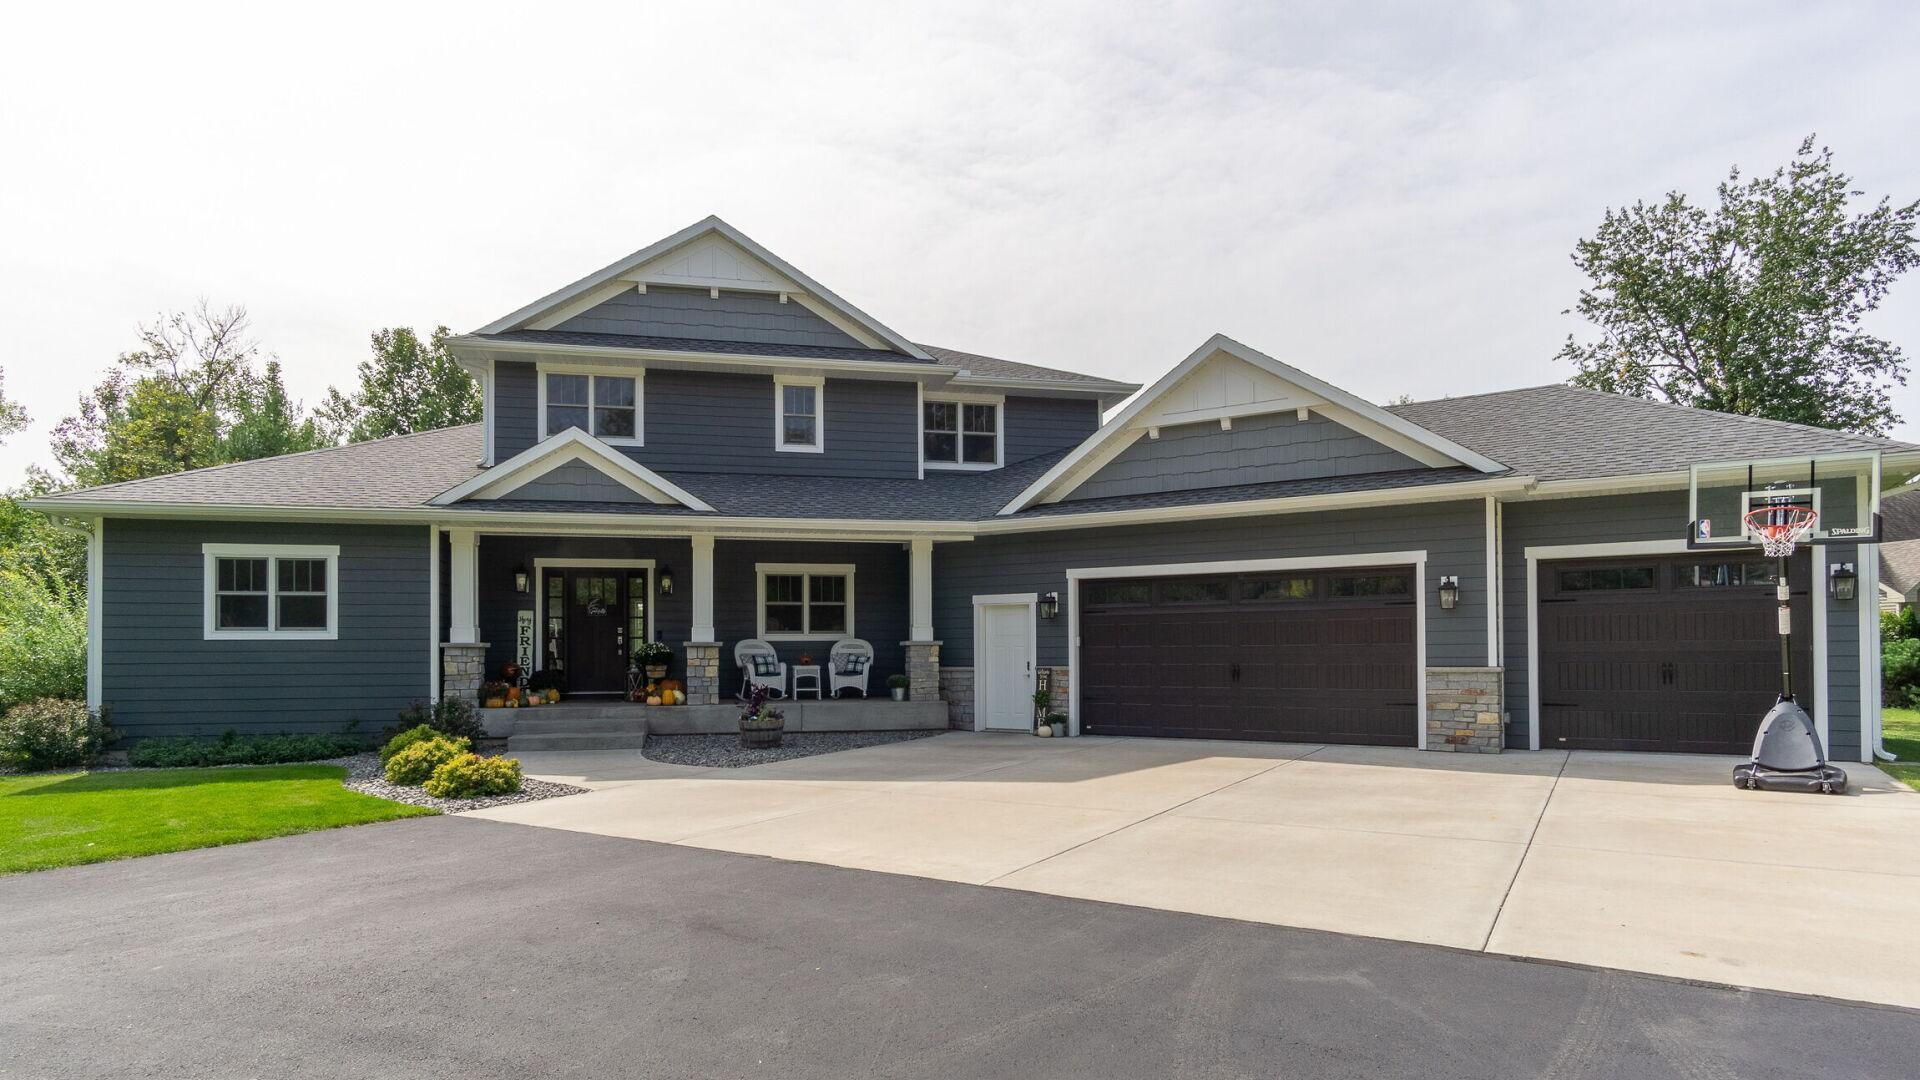 N6839 579th Street Property Photo - Menomonie, WI real estate listing